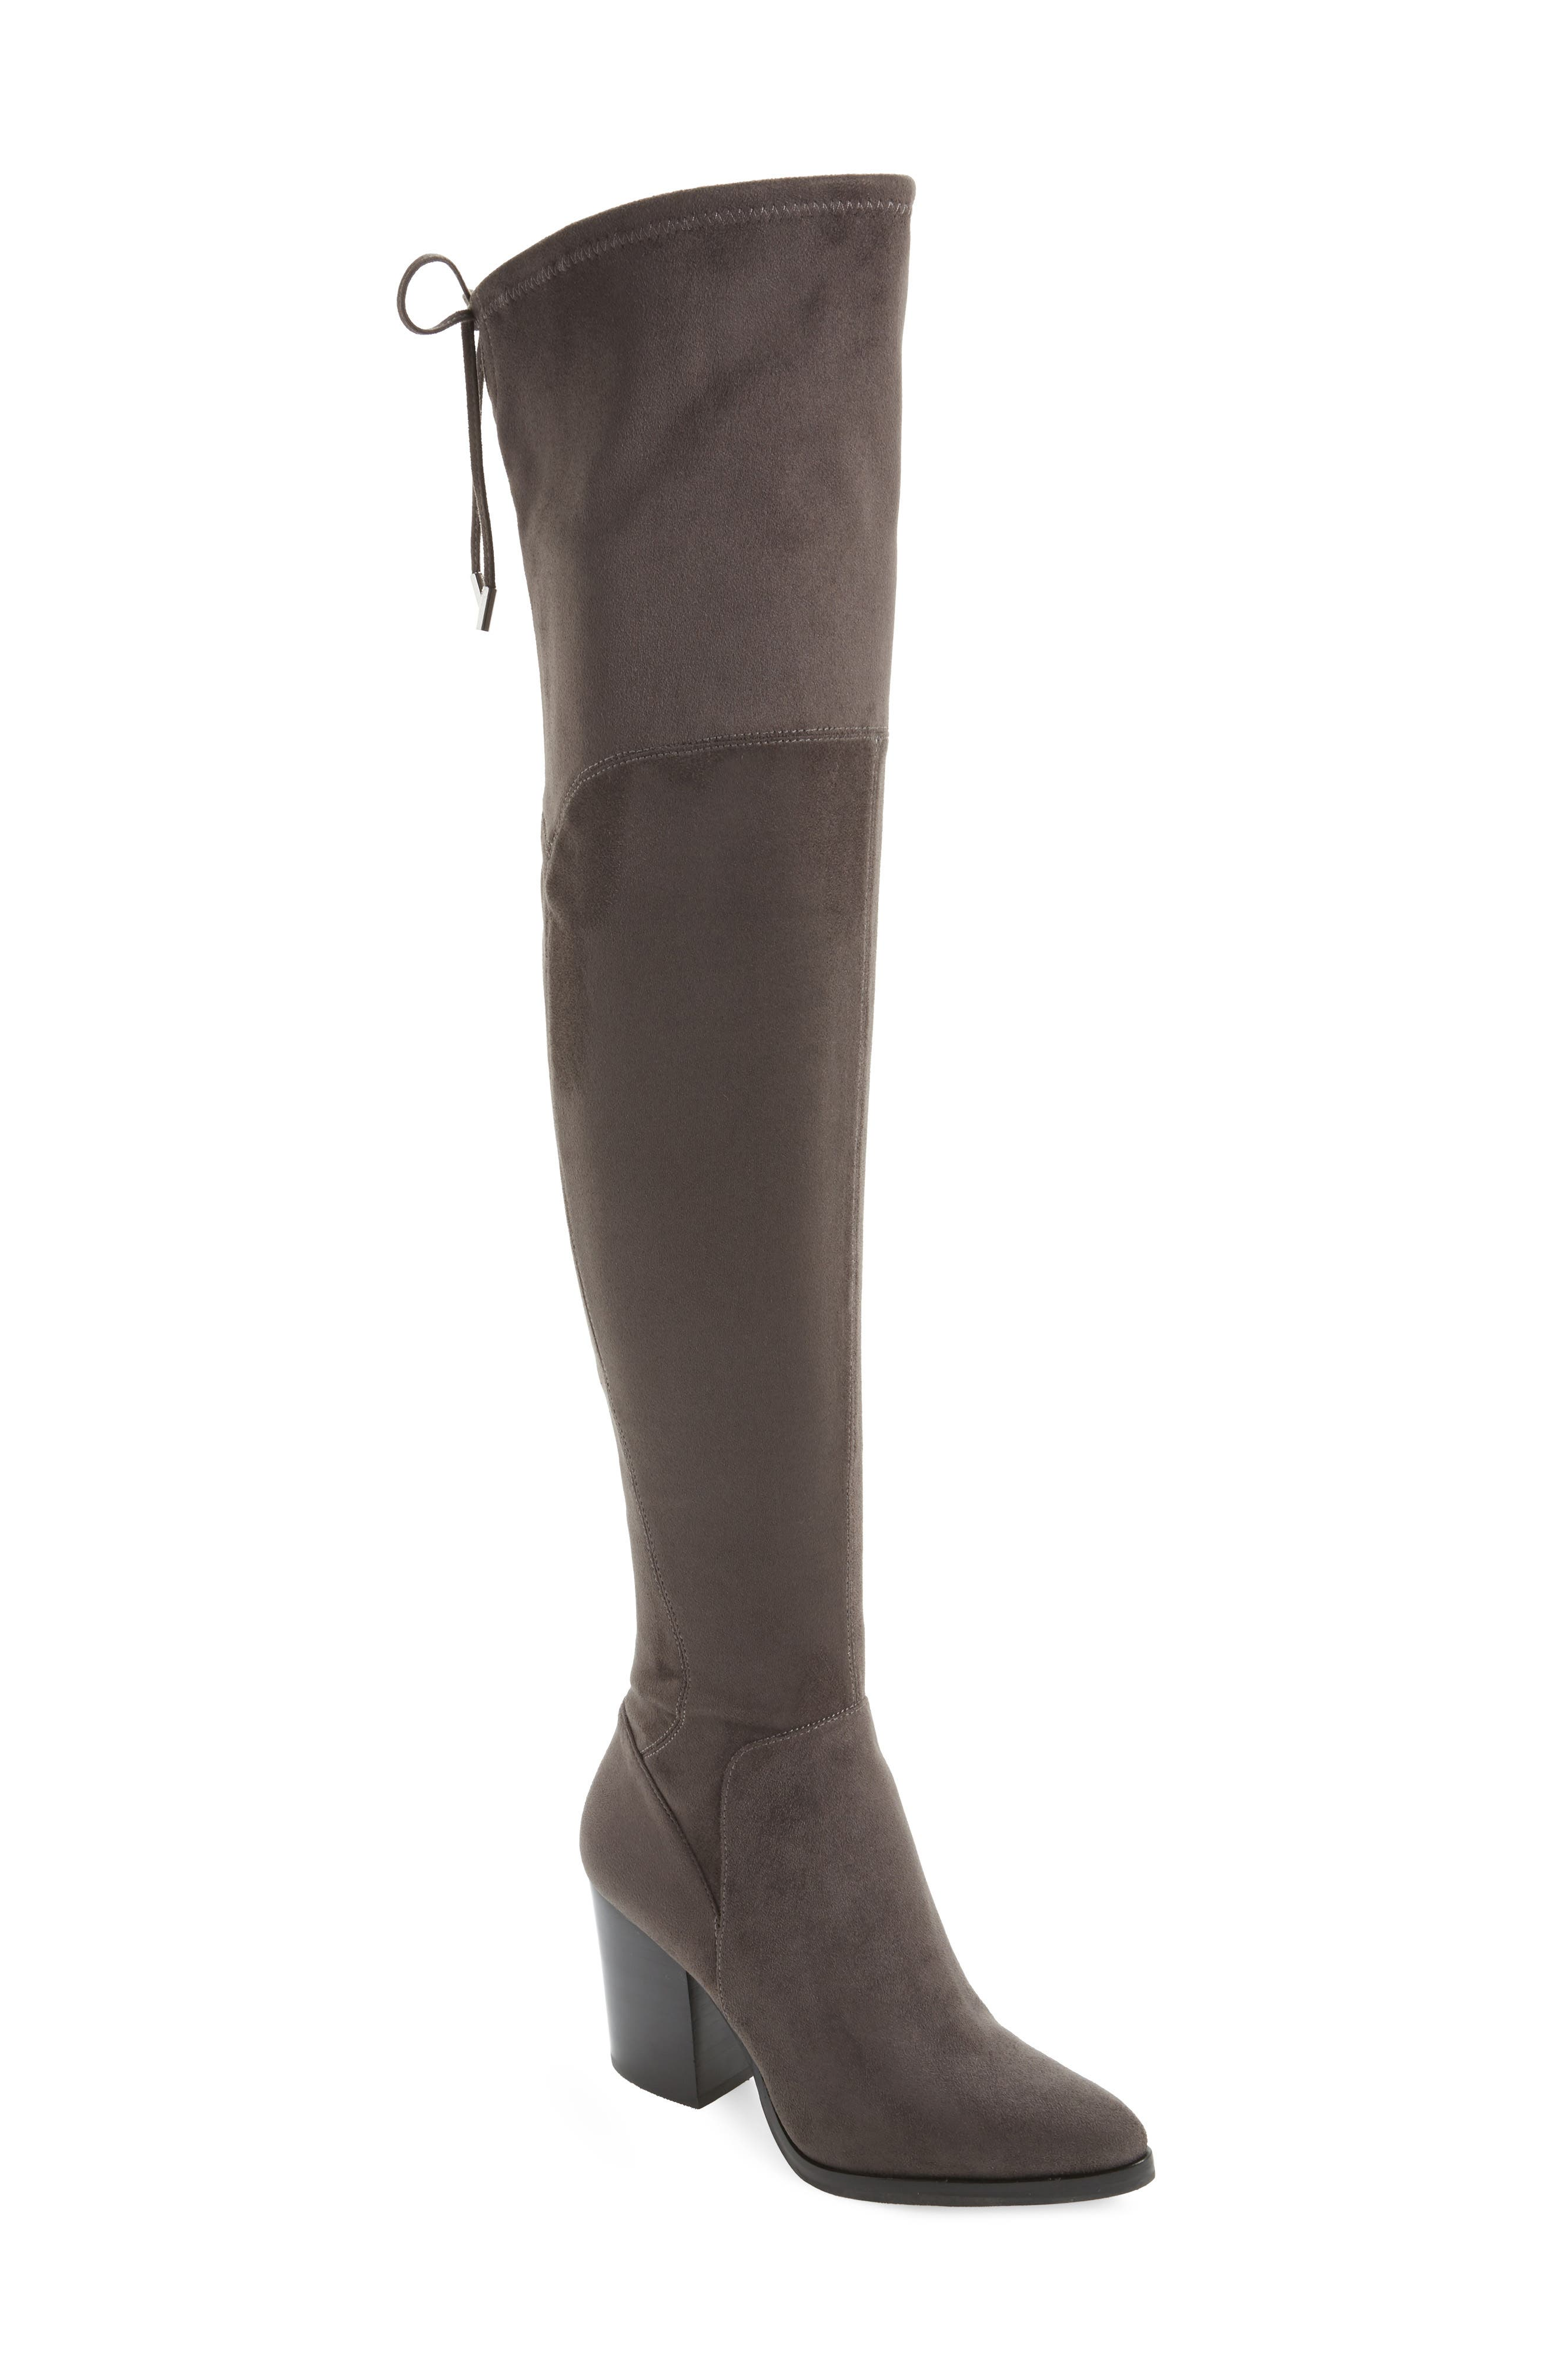 Main Image - Marc Fisher LTD Adora Over the Knee Boot (Women)